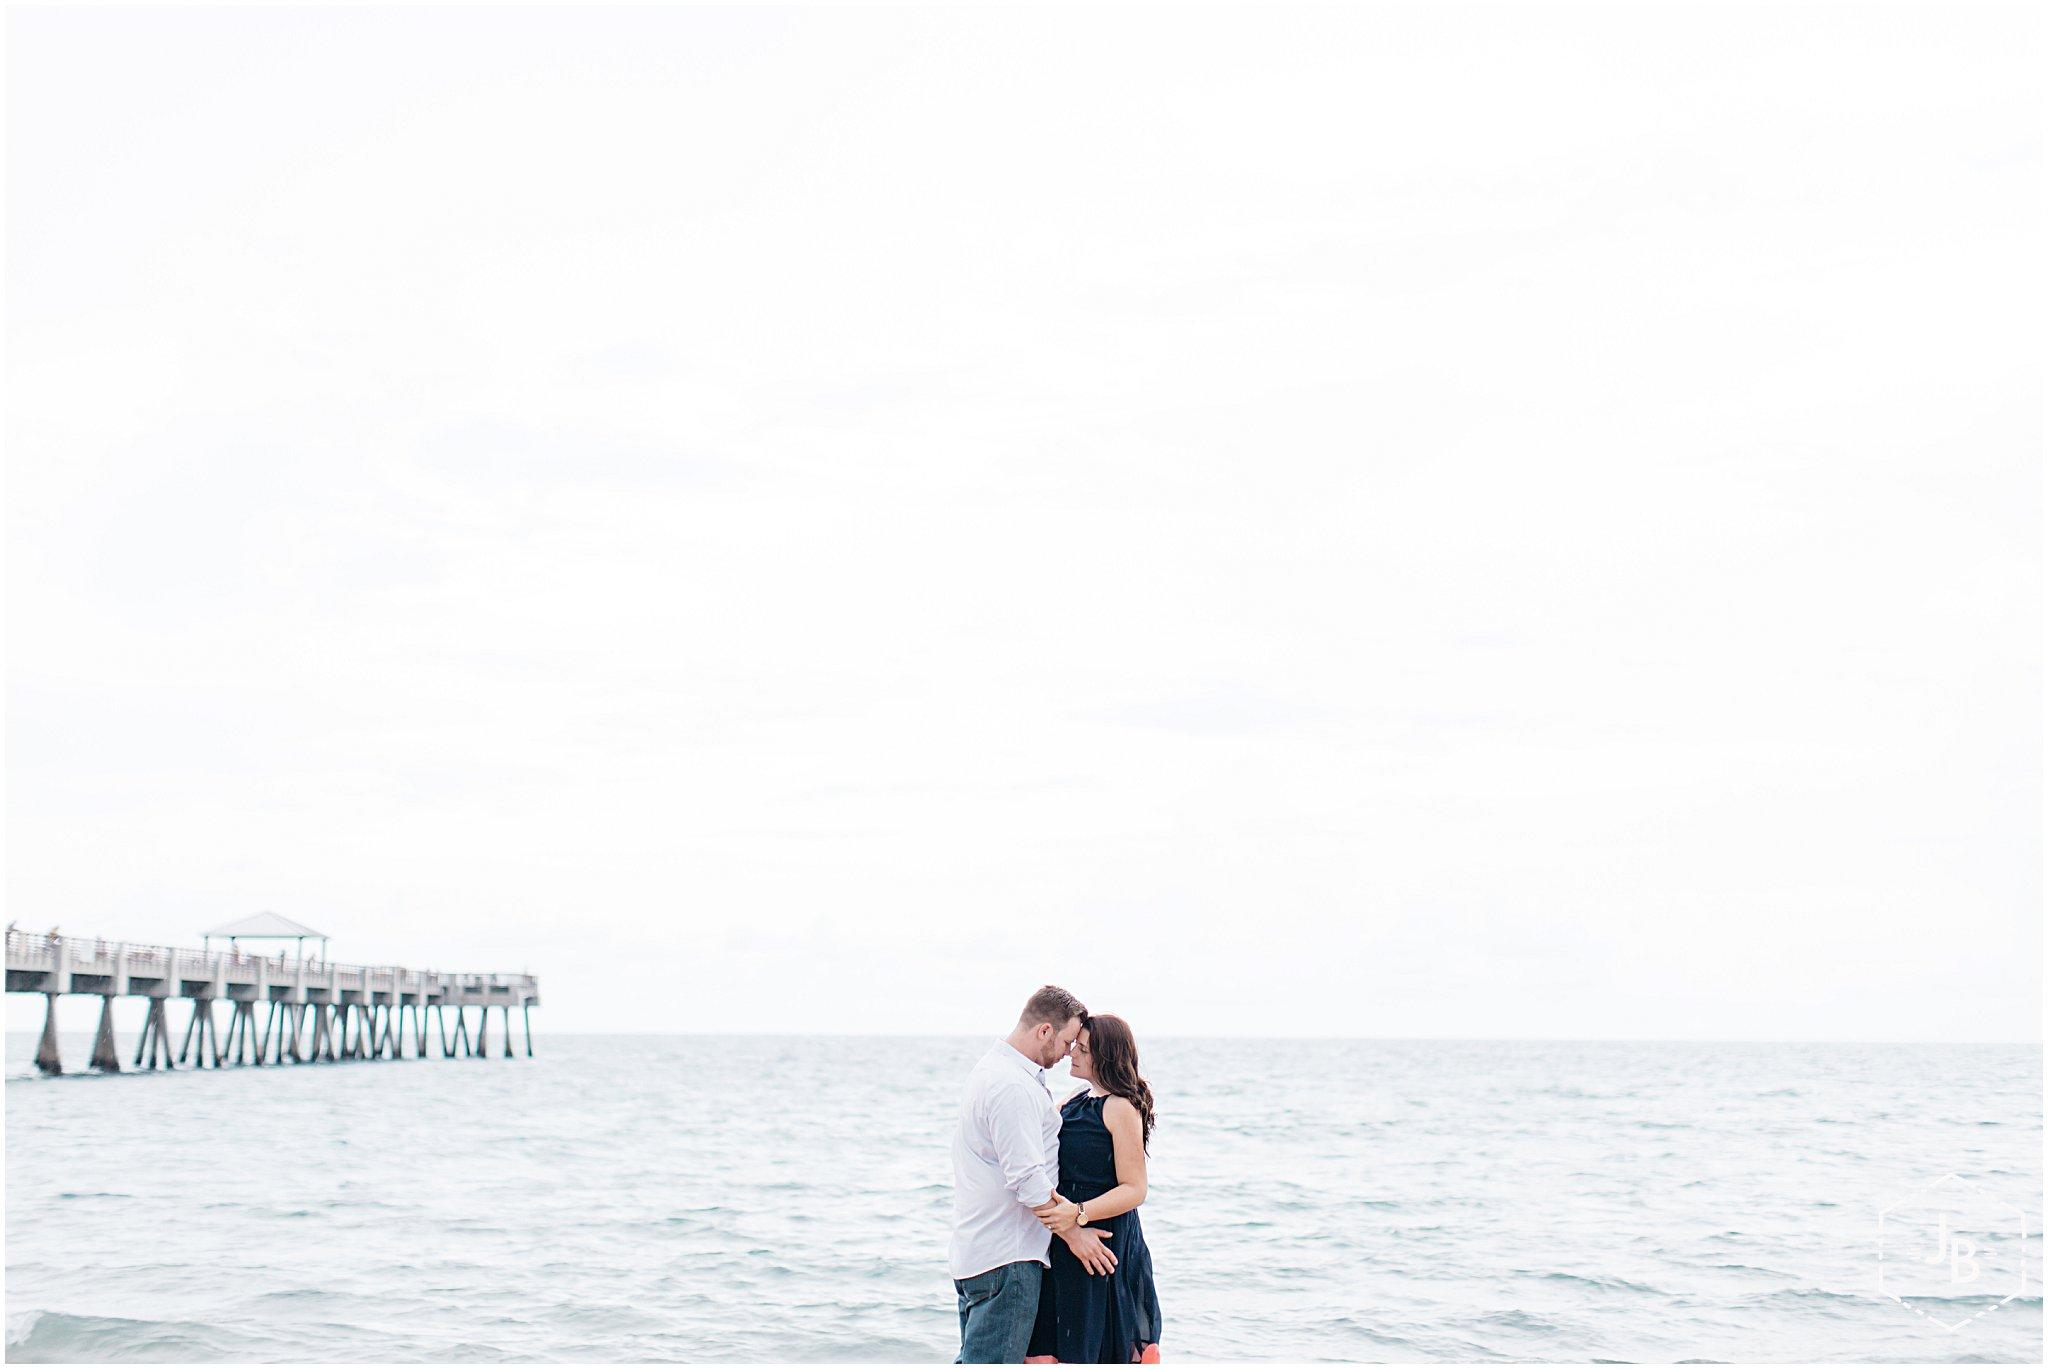 WeddingandEngagementFloridaPhotographer_0012.jpg